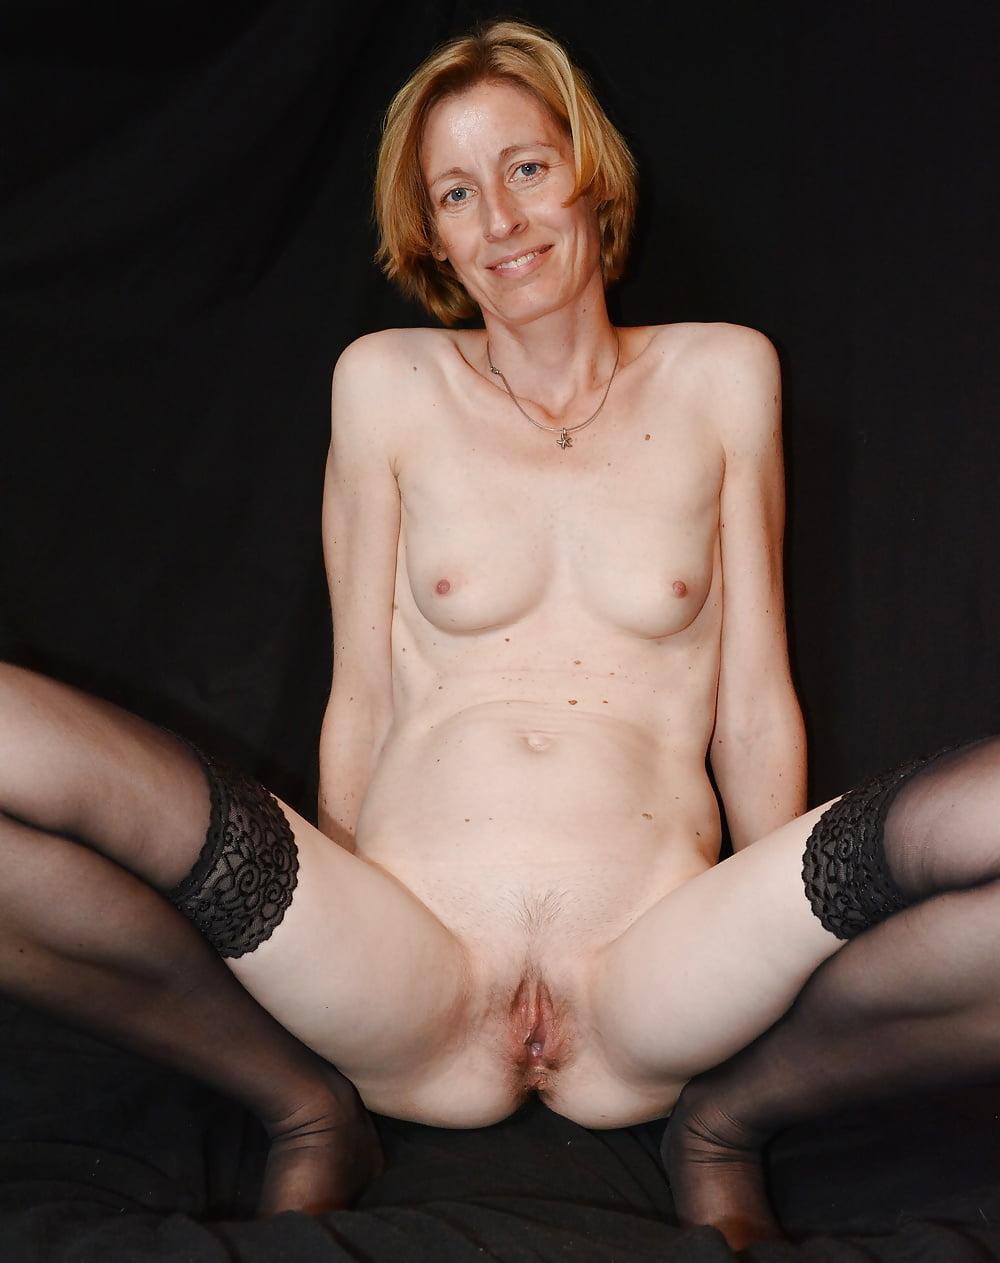 skinny-milf-sluts-miley-cyrus-short-hair-porn-fakes